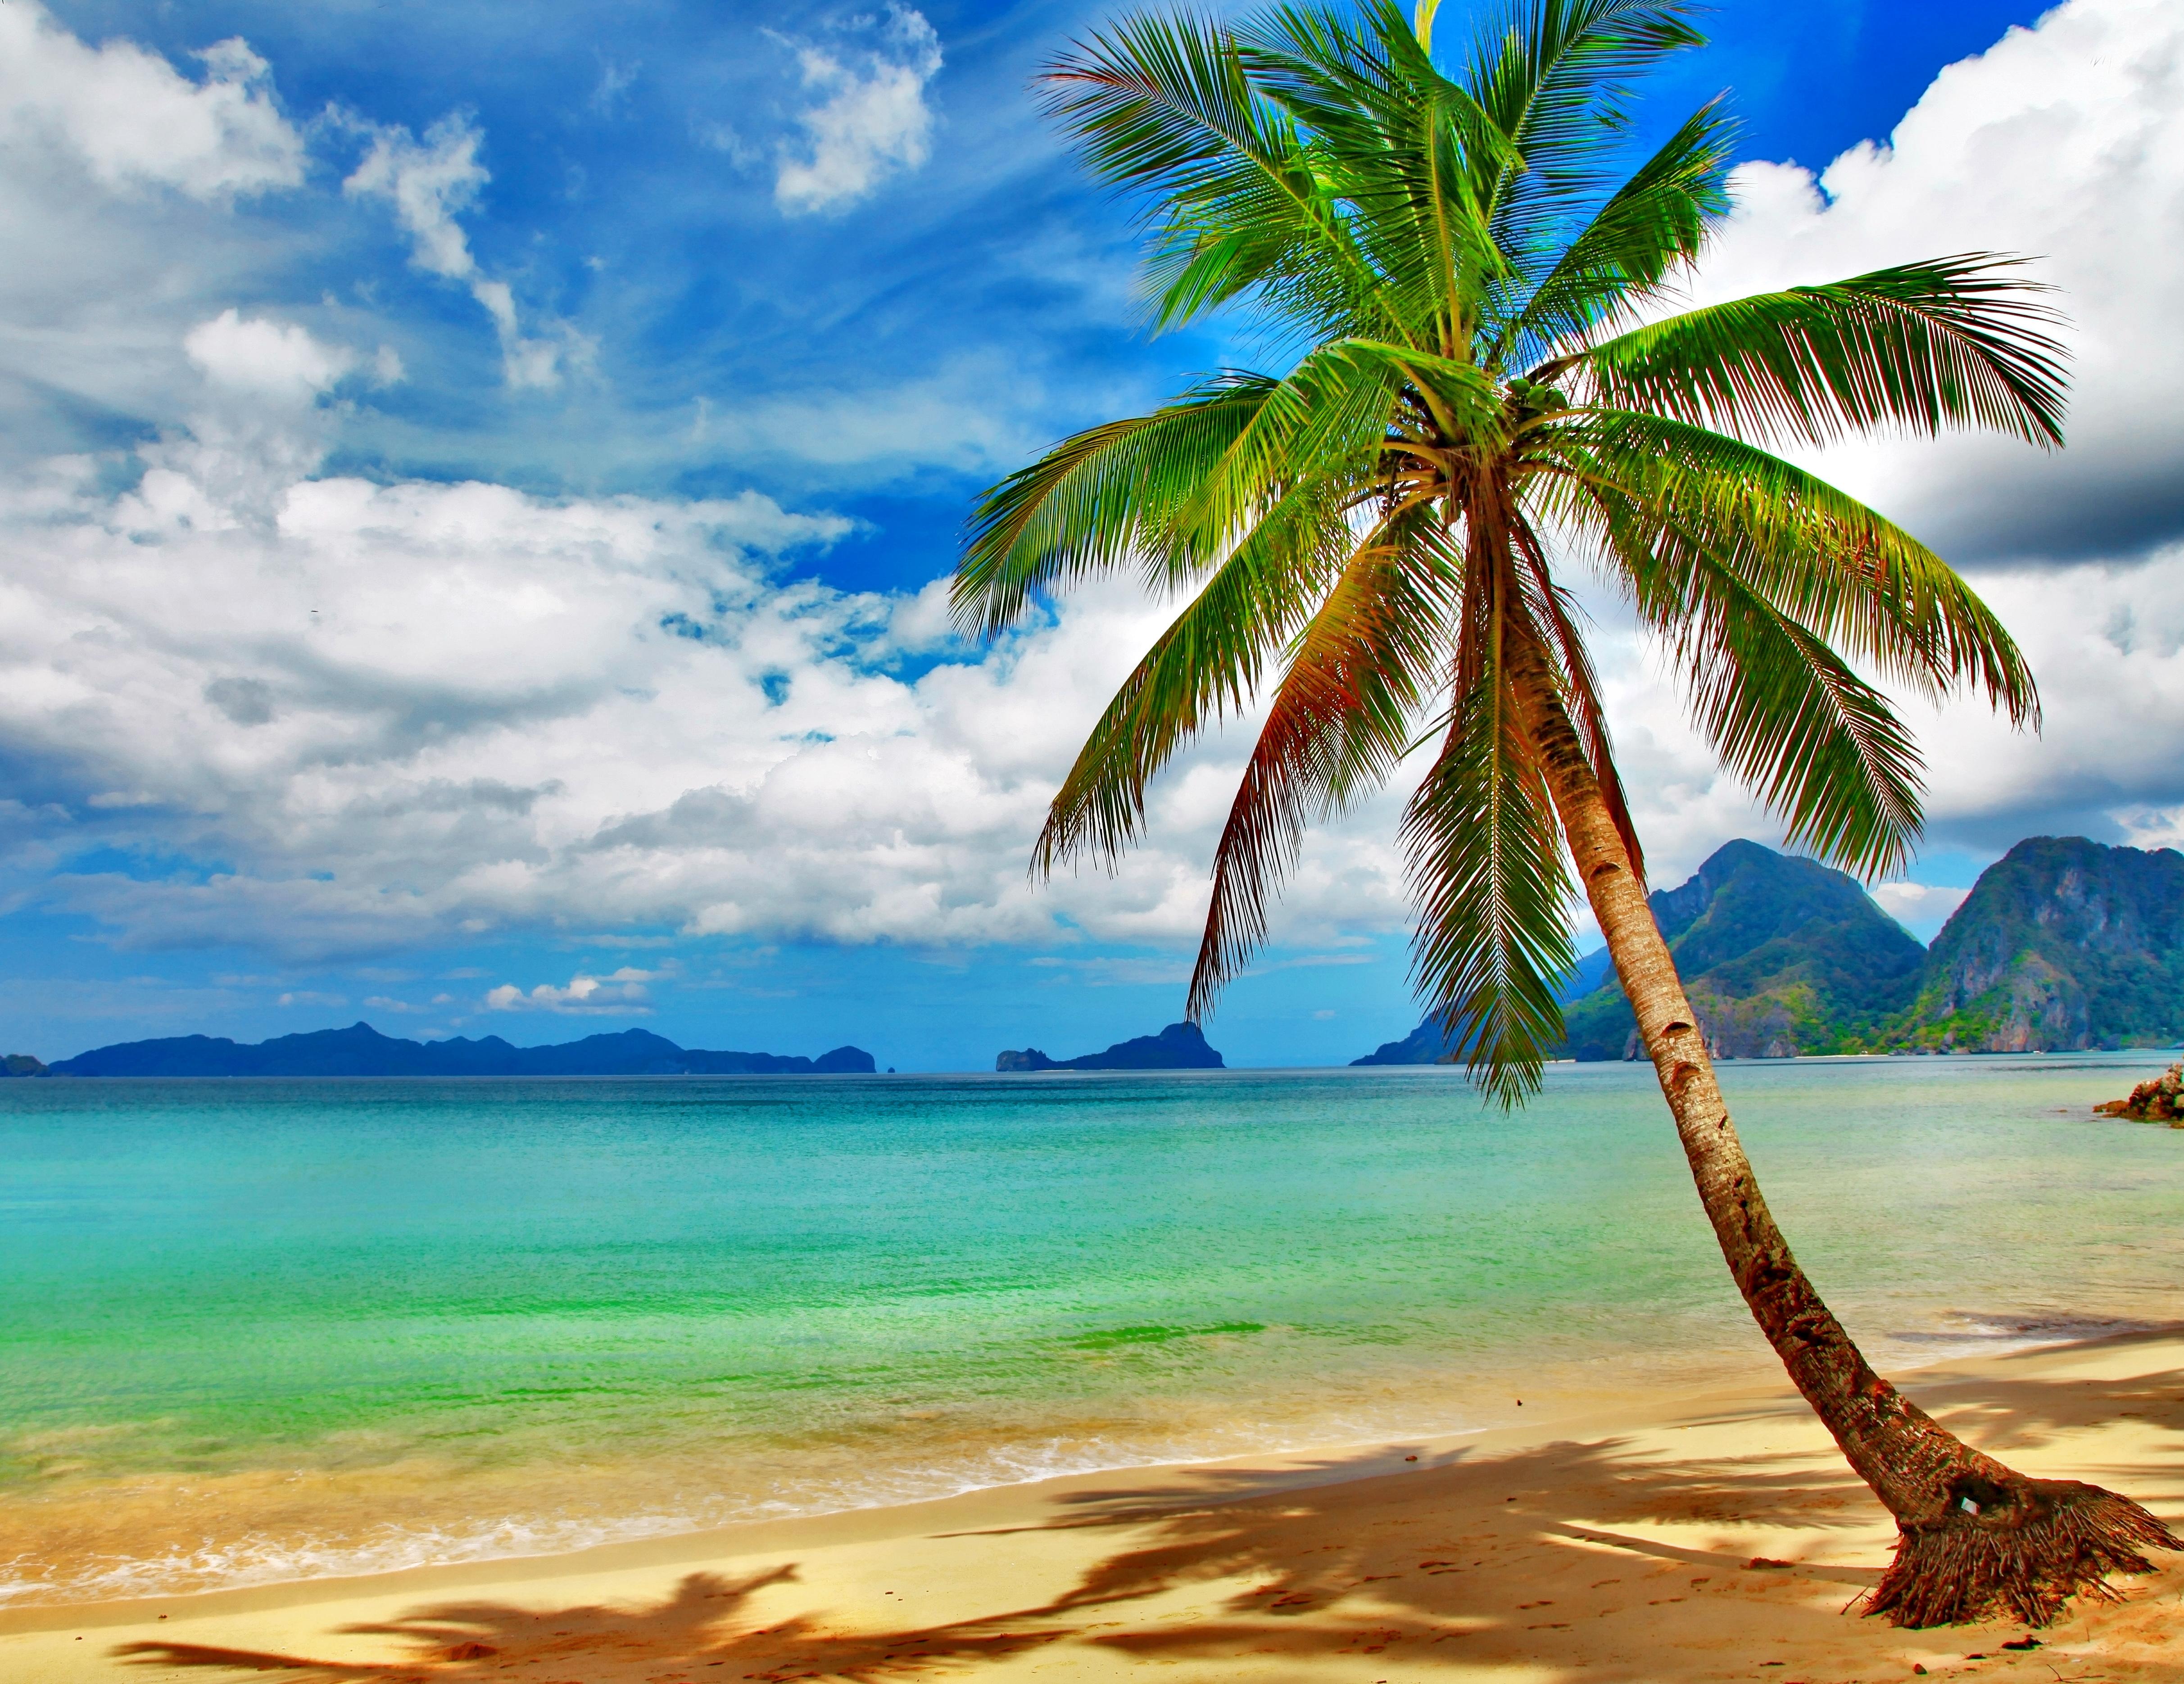 Hd Tropical Island Beach Paradise Wallpapers And Backgrounds: 4850x3740px Tropical Beach Wallpaper Desktop